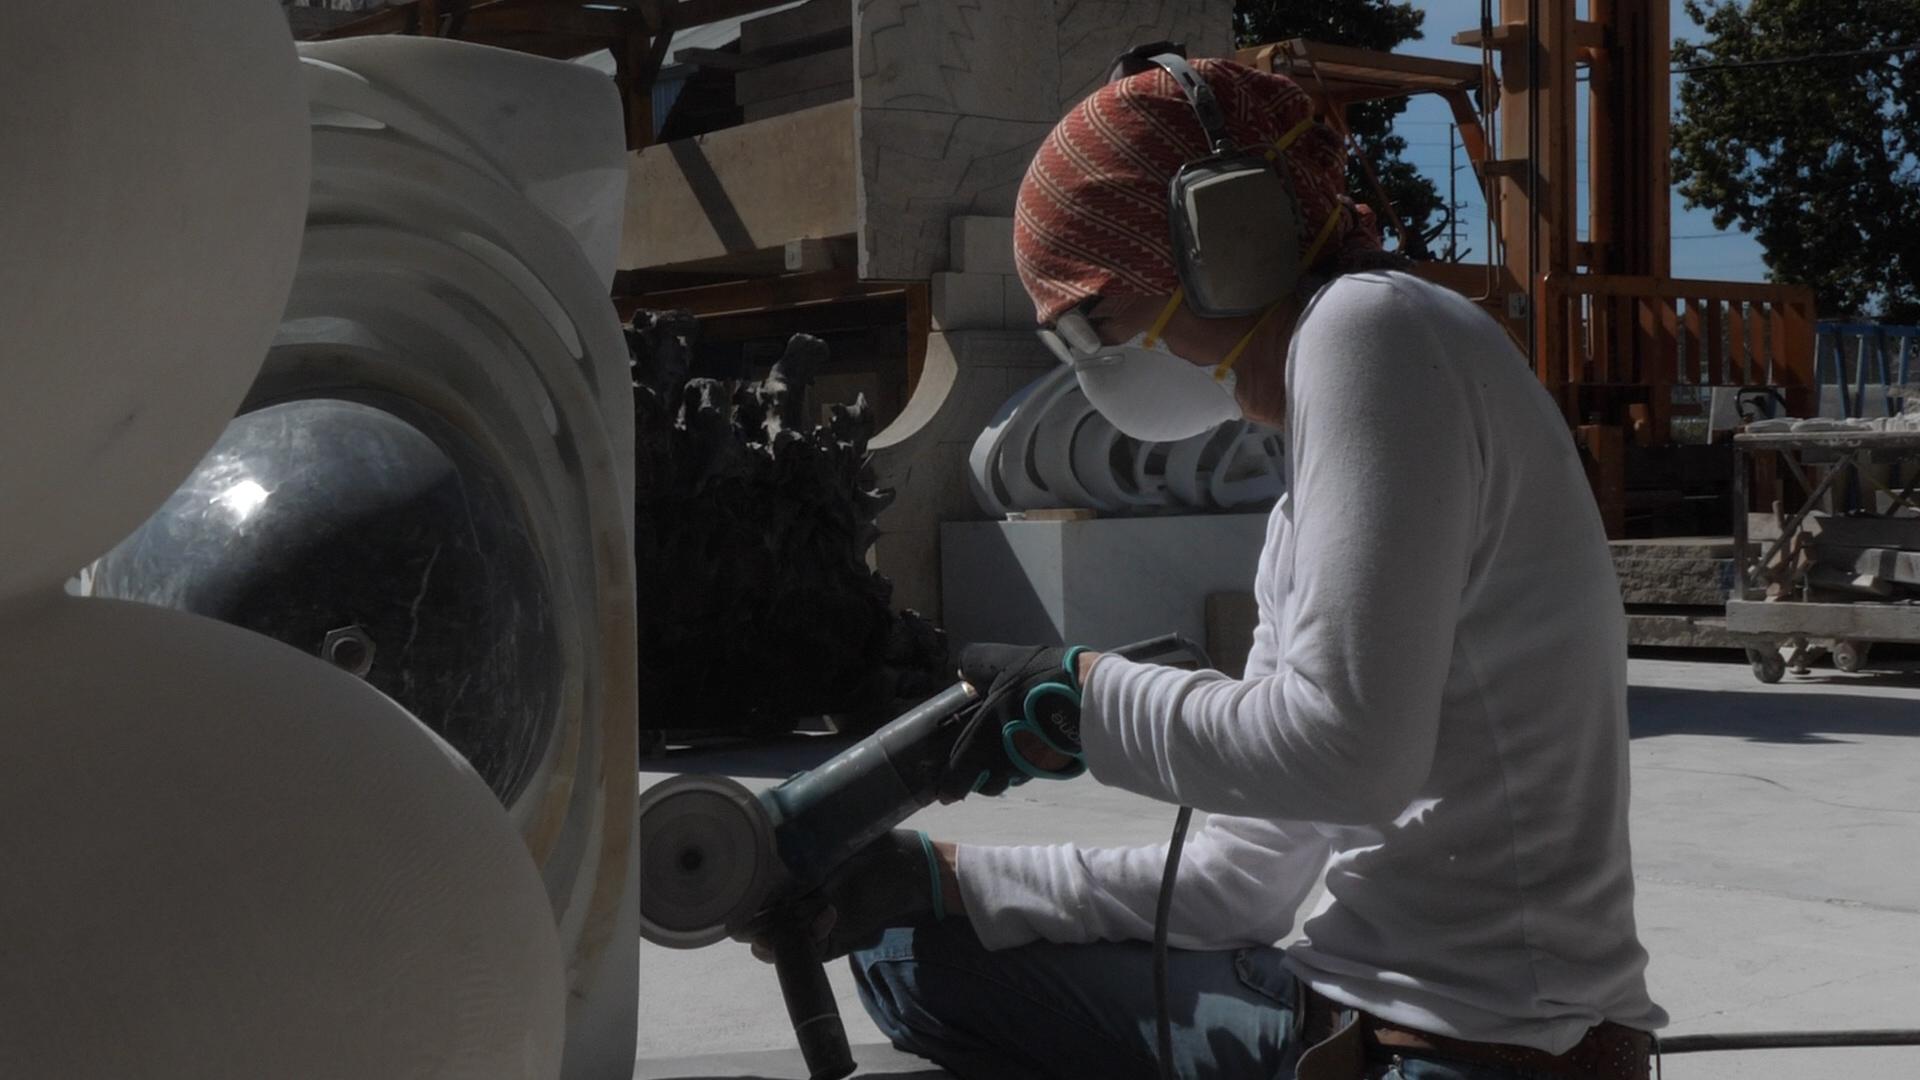 Elizabeth Turk focuses as she angle grinds a statue.jpg